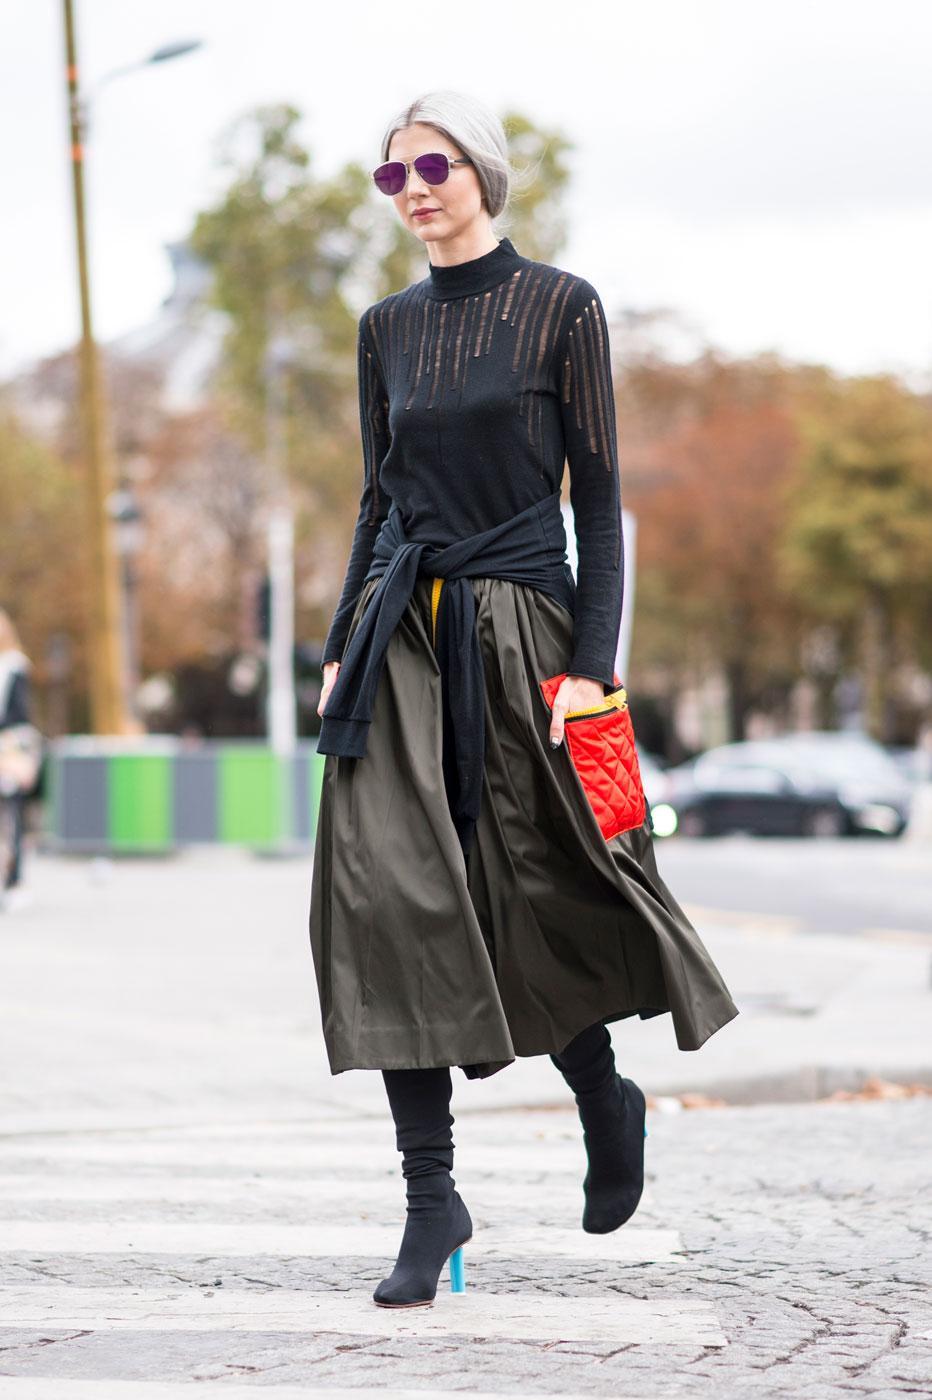 bottes comment les associer une jupe madame figaro. Black Bedroom Furniture Sets. Home Design Ideas